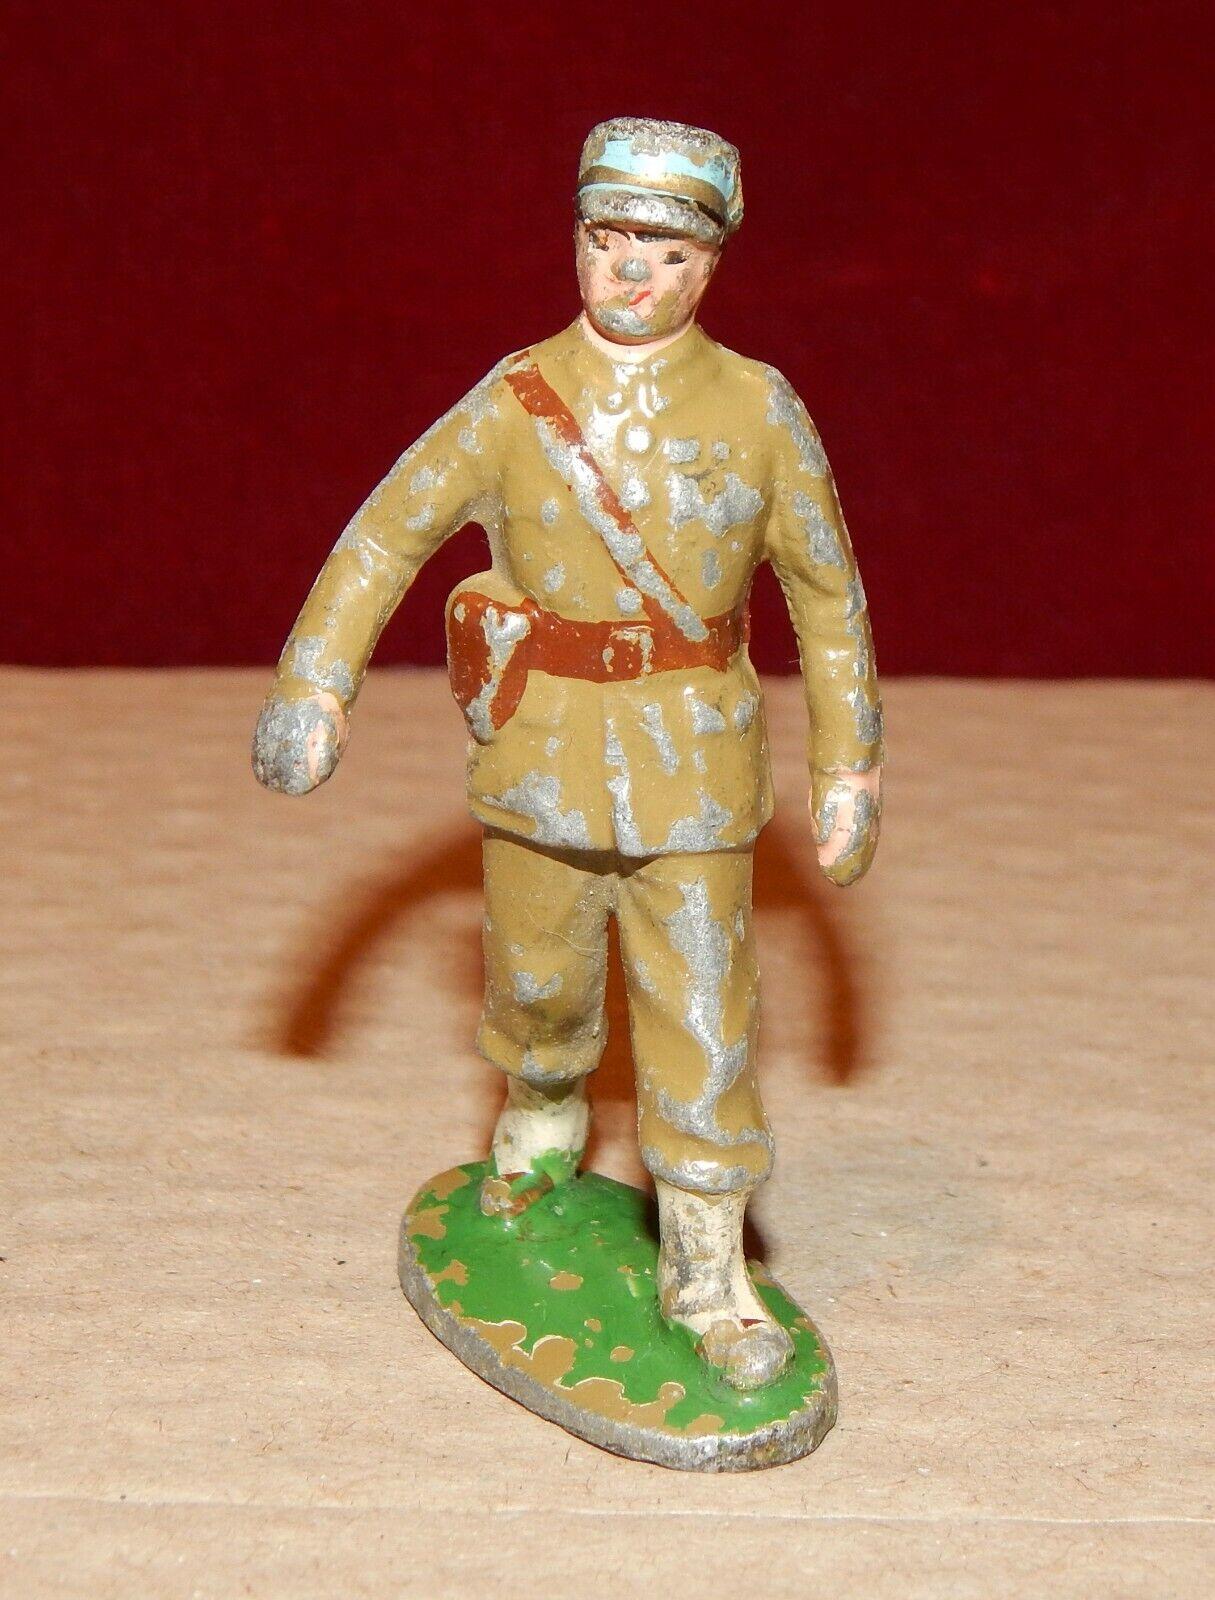 Quiralu, Oficial de Fusileros Marroquí de Desfile, 1945 1950